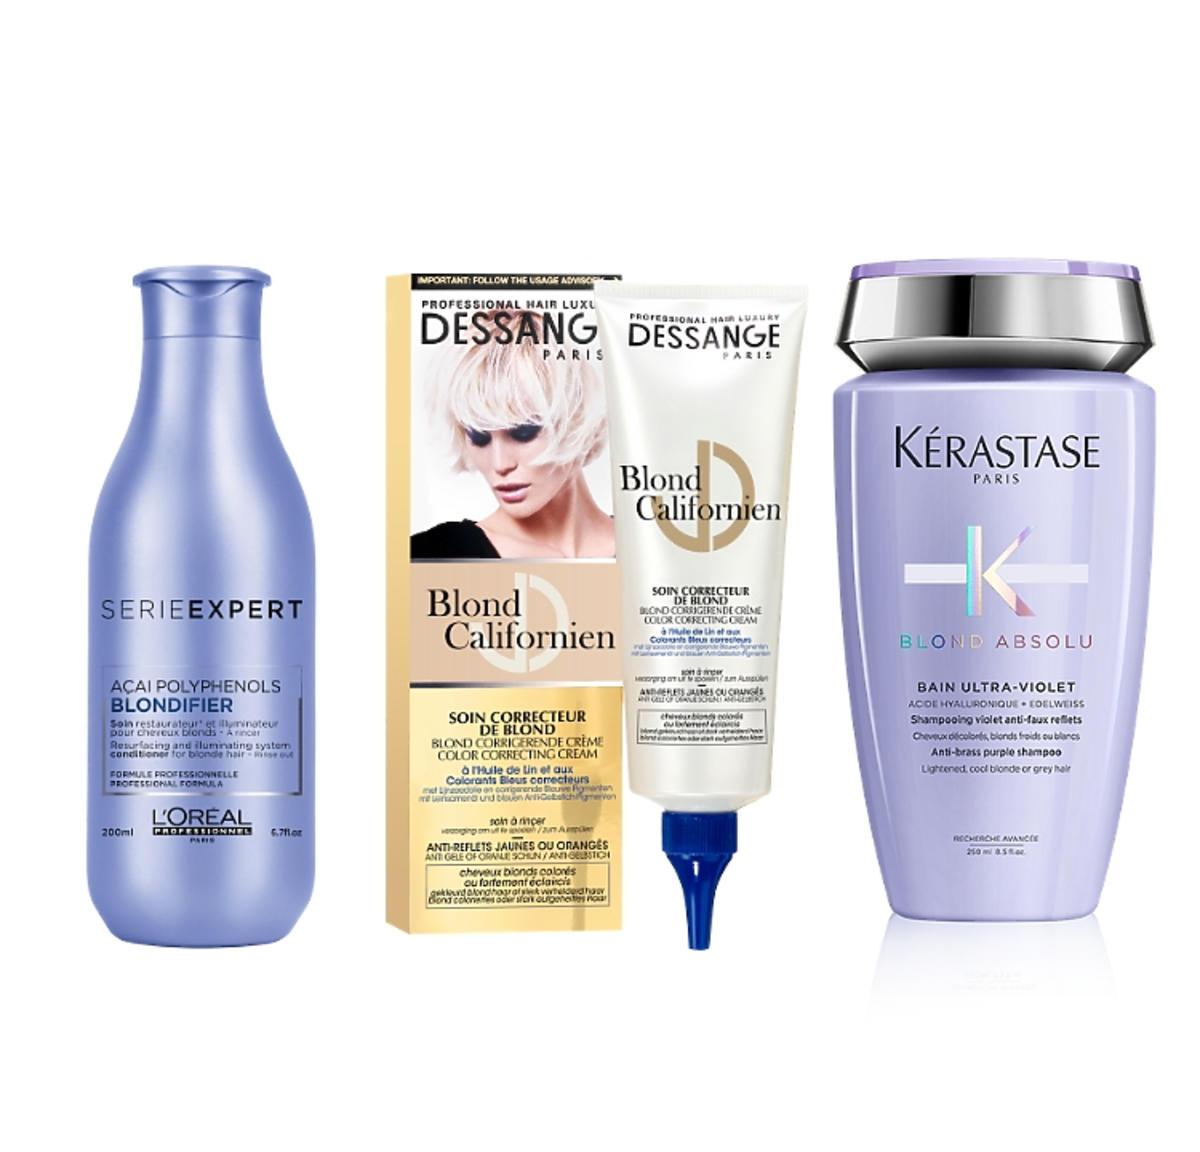 Kosmetyki ochładzające kolor włosów blond: L'Oréal Professionnel, Dessange, Kérastase